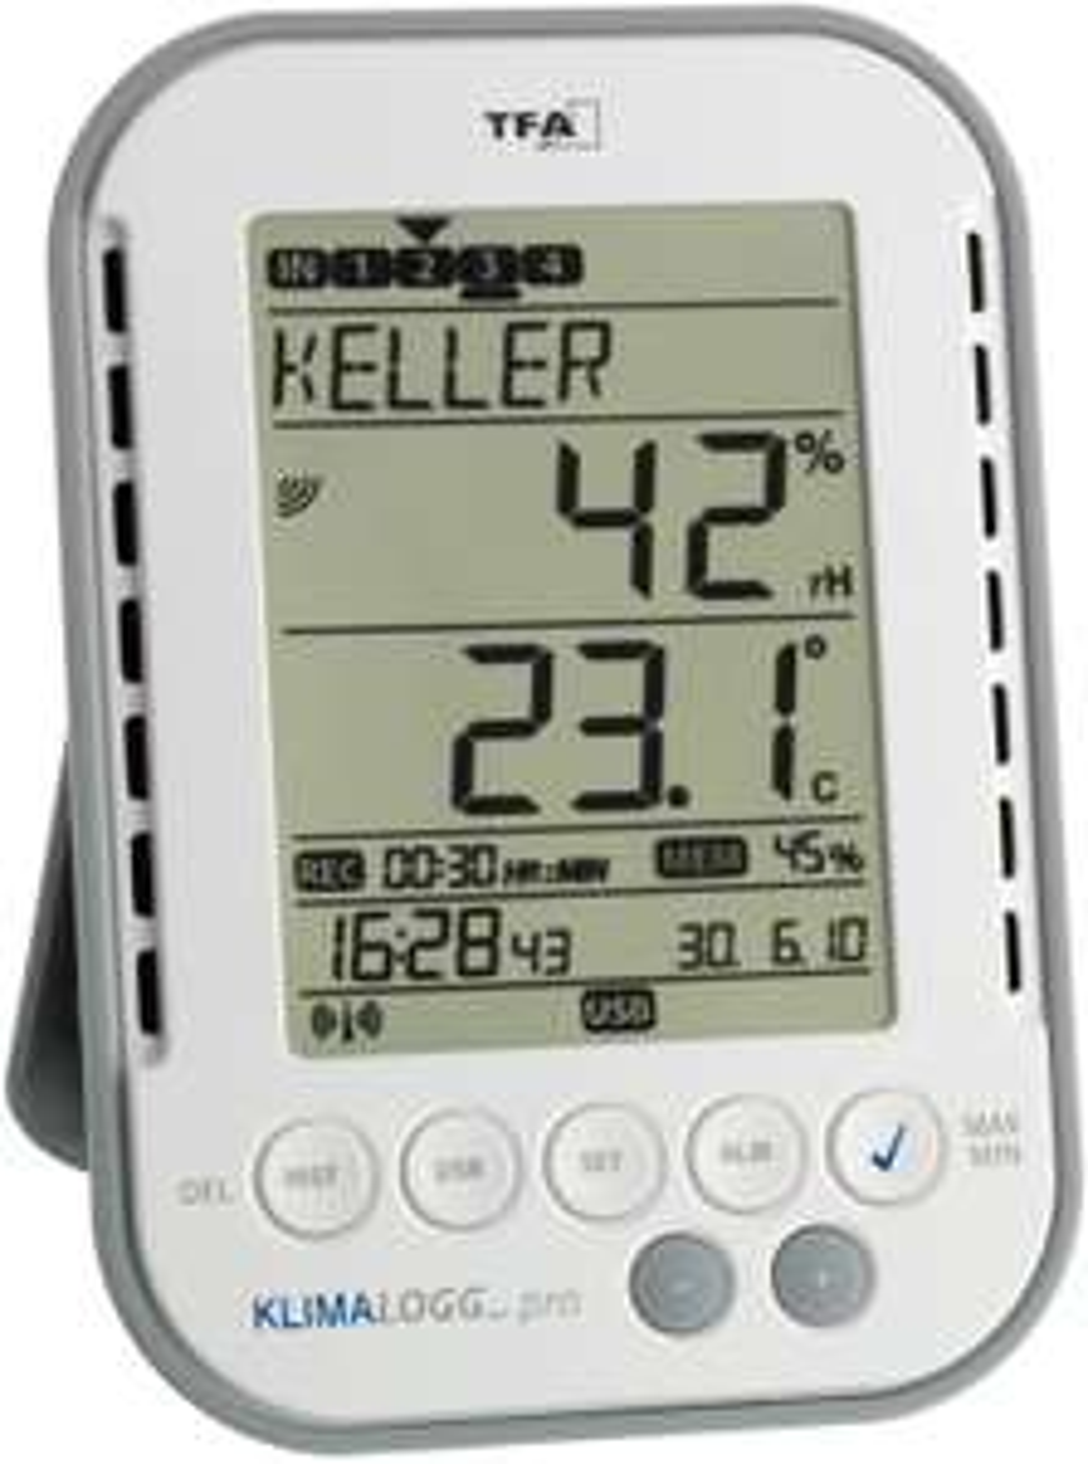 TFA Dostmann KlimaLogg Pro Temperatur-/Feuchtestation Digital (30.3039)